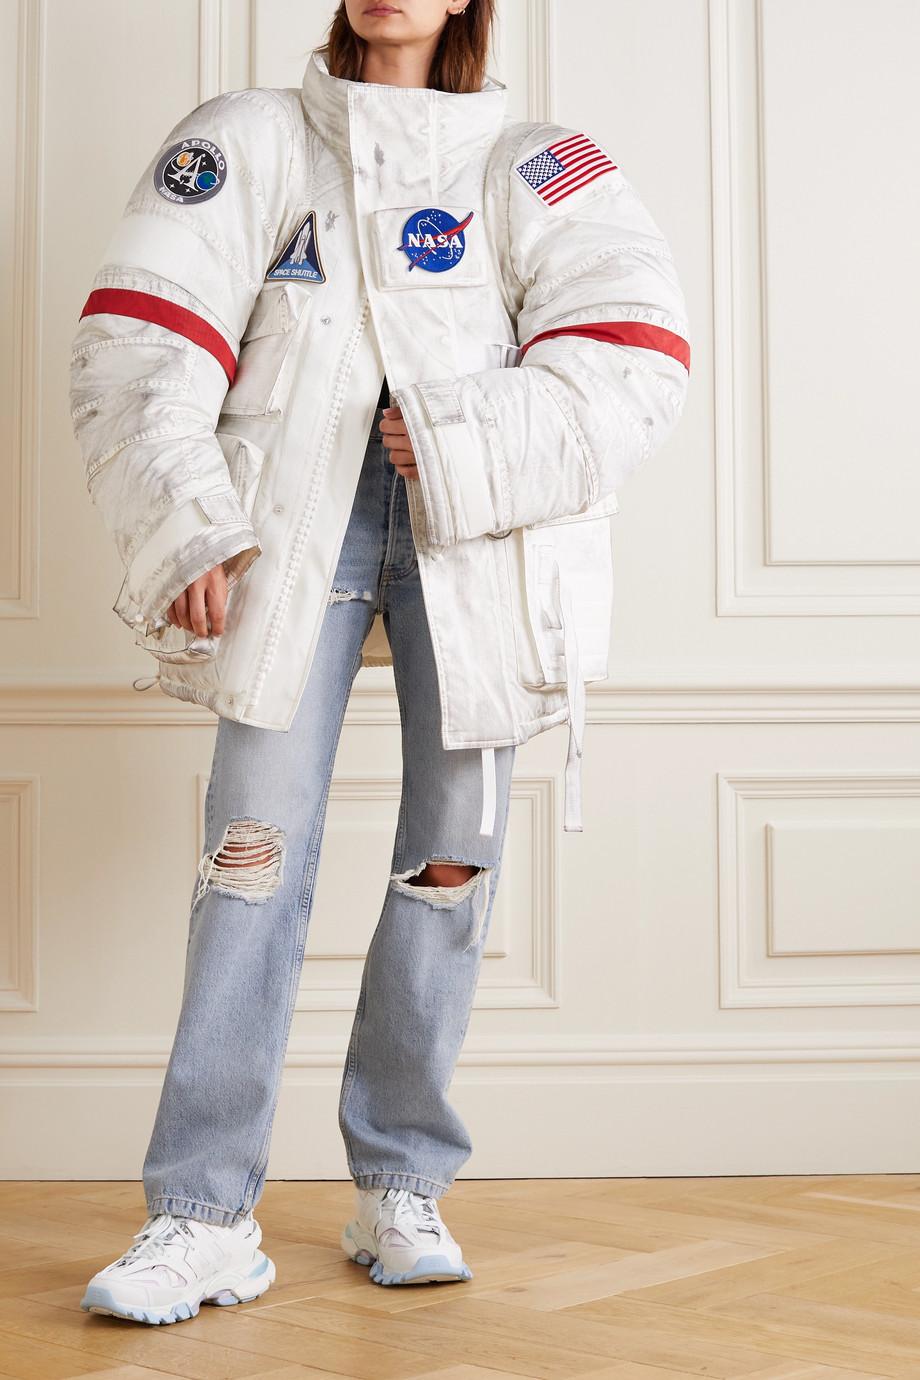 Balenciaga Space Oversized-Jacke aus gestepptem Shell mit Applikationen in Distressed-Optik